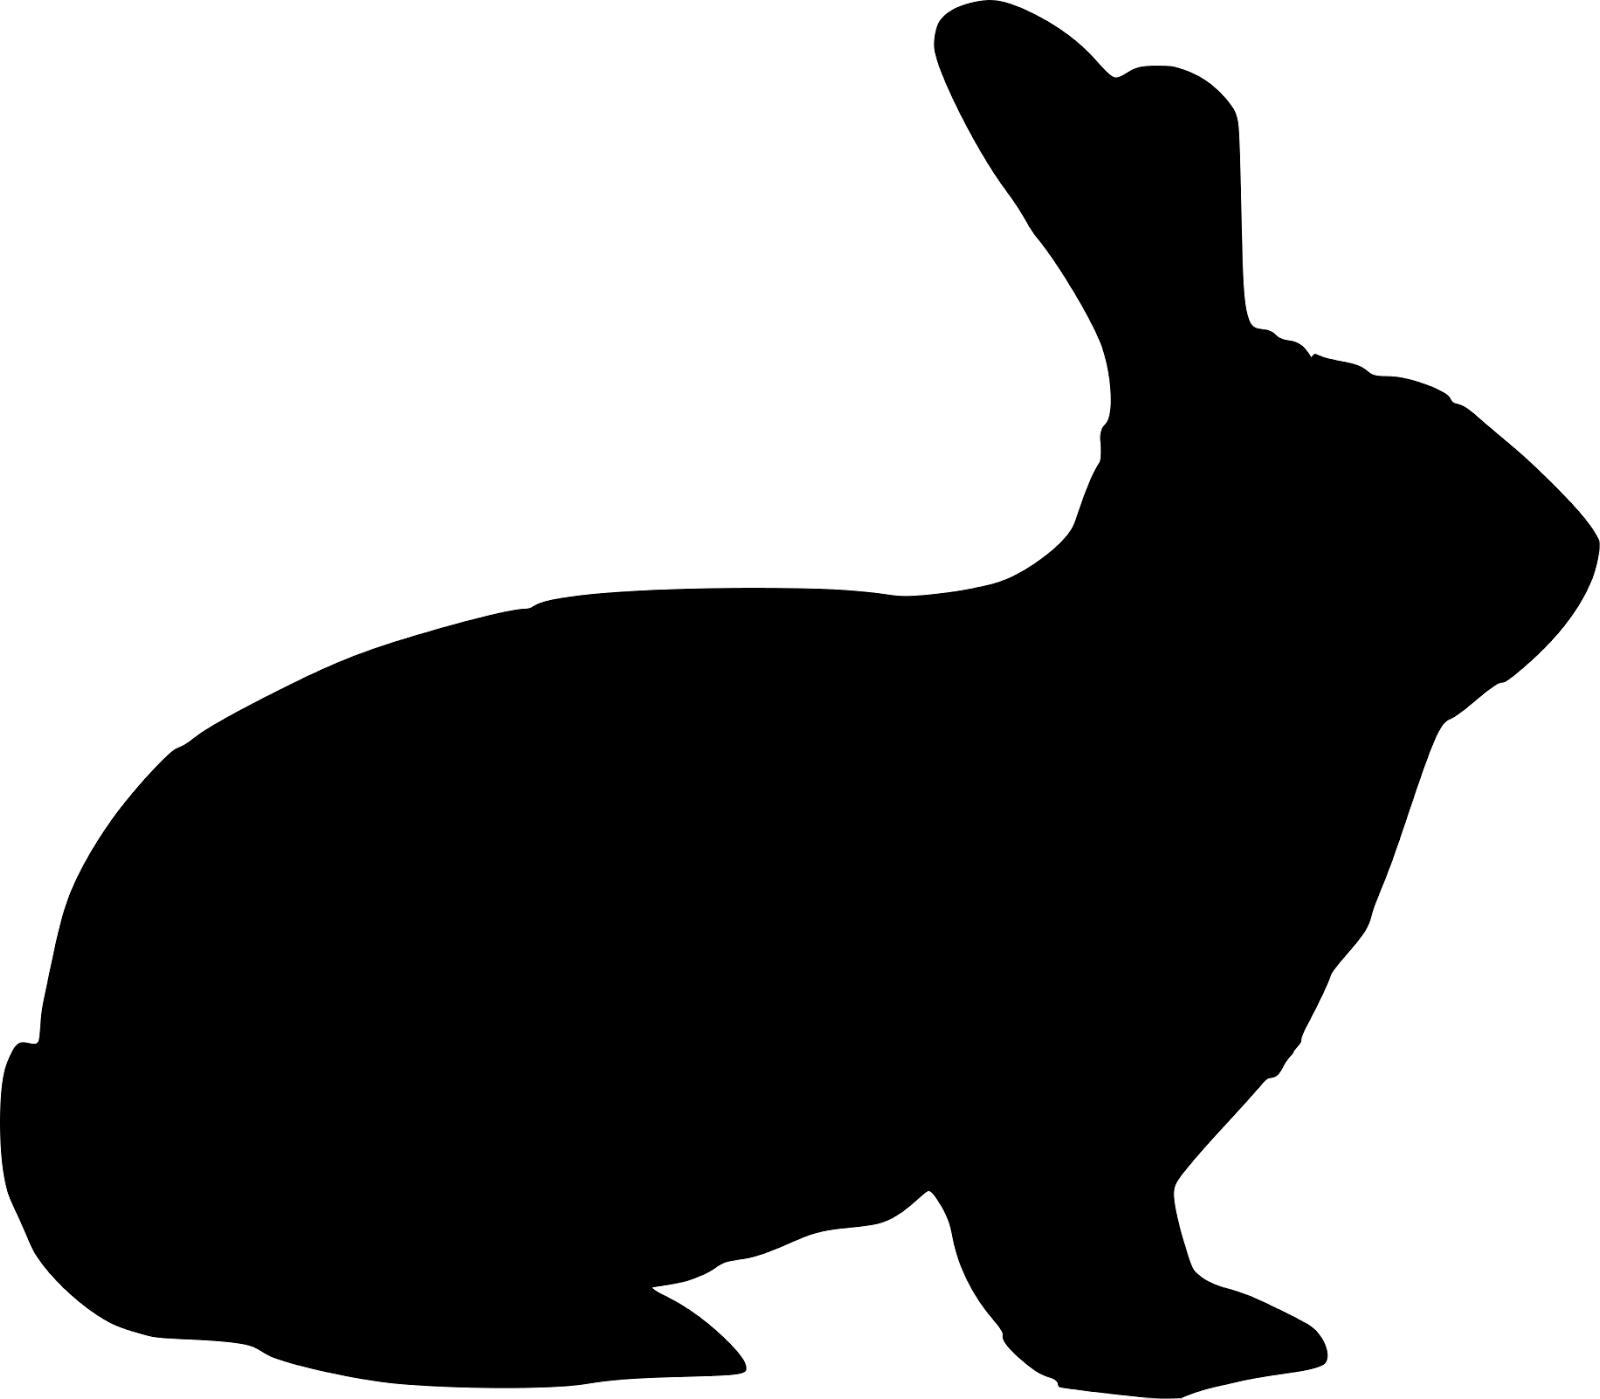 1600x1399 Rabbit Clipart Silhouette